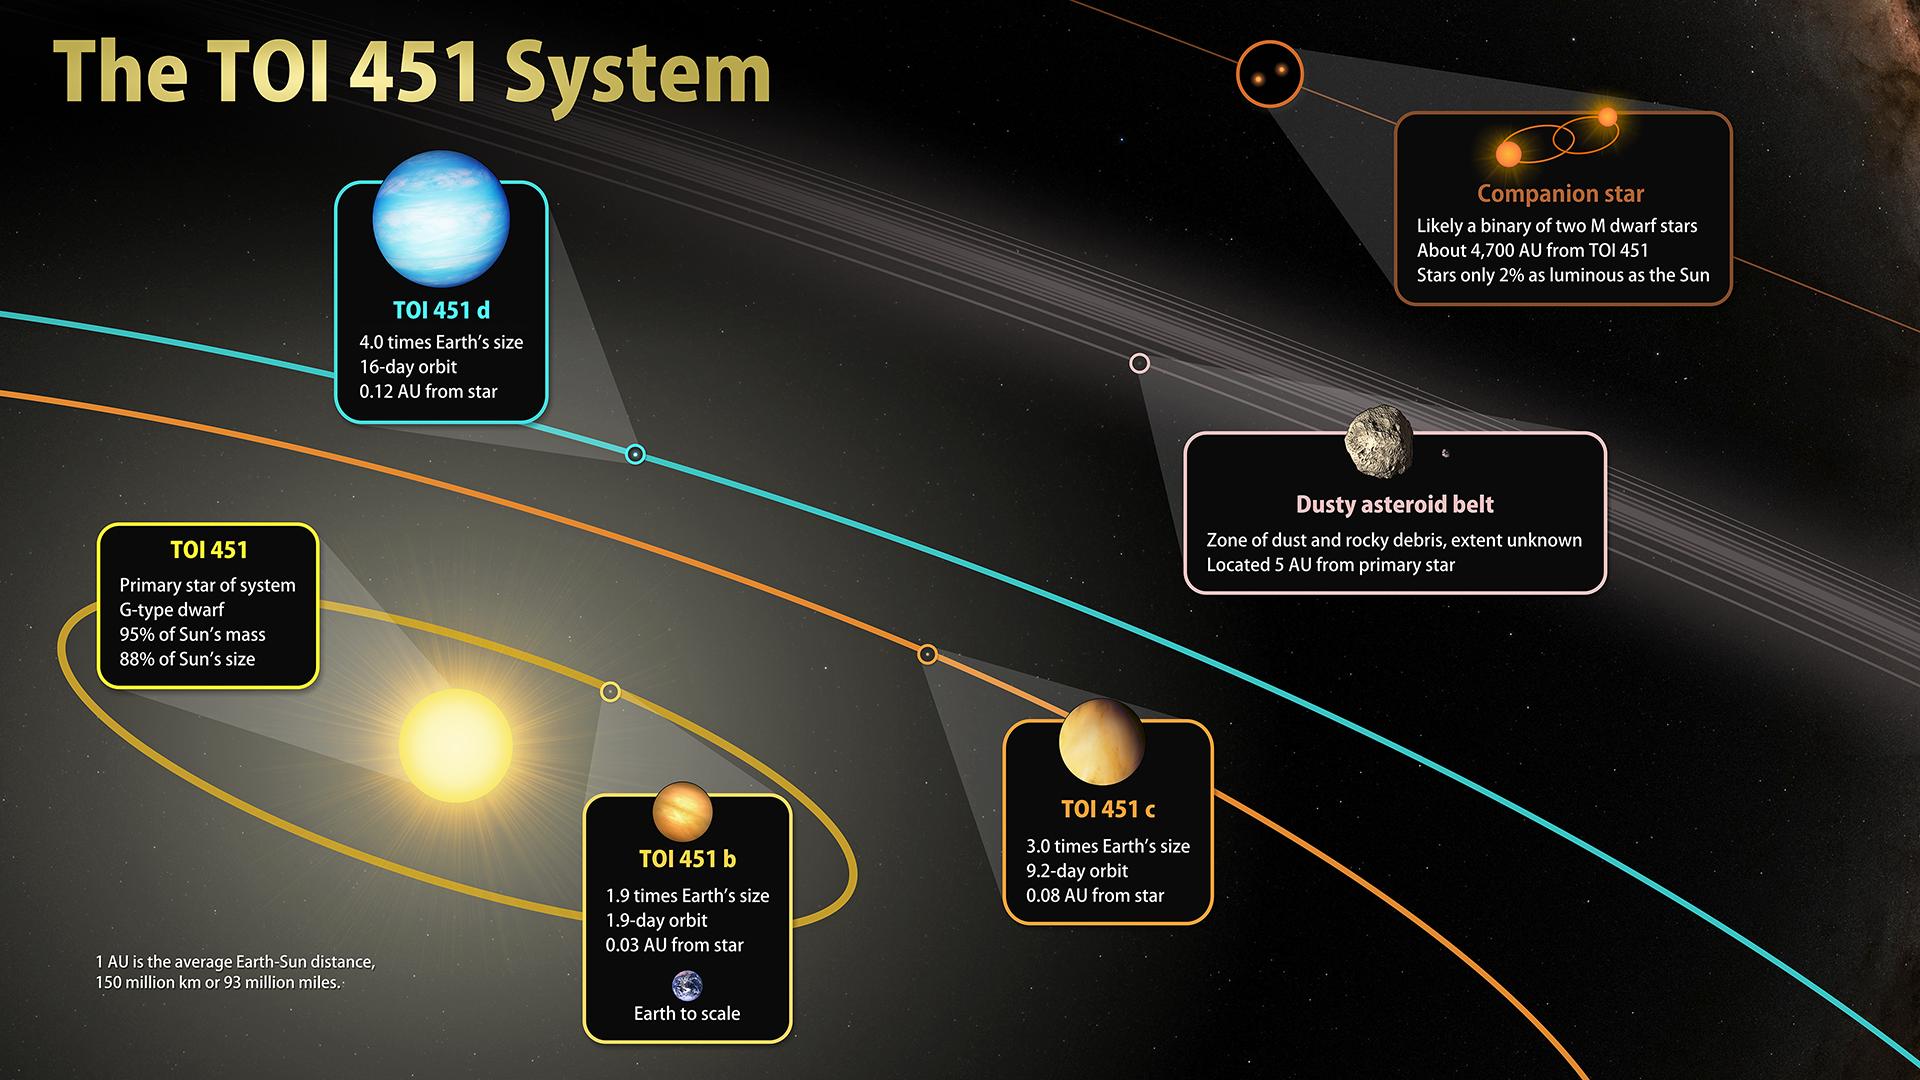 toi 451 infographic 1041.